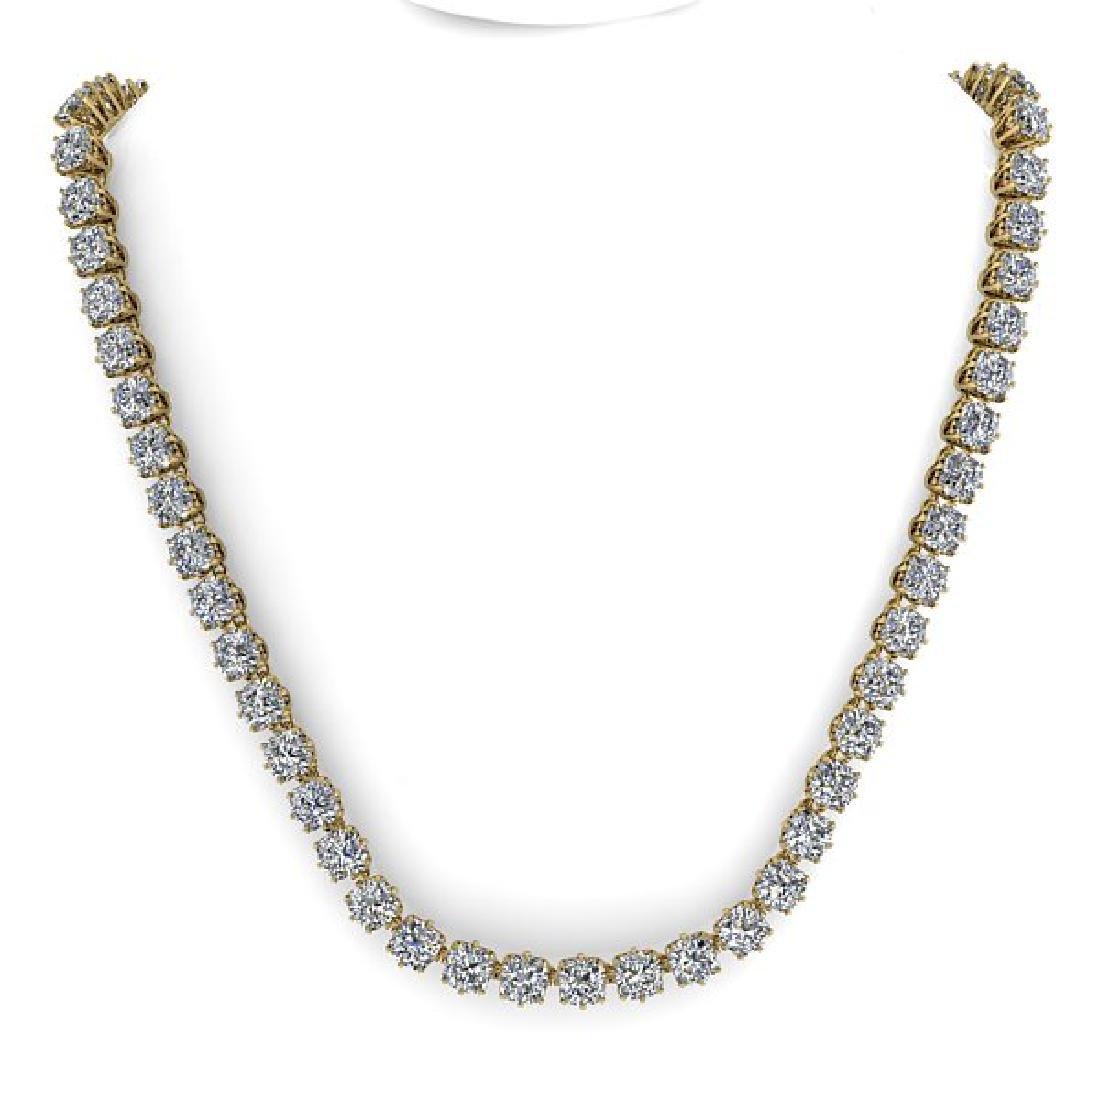 28 CTW Oval Cut SI Certified Diamond Necklace 14K - 3